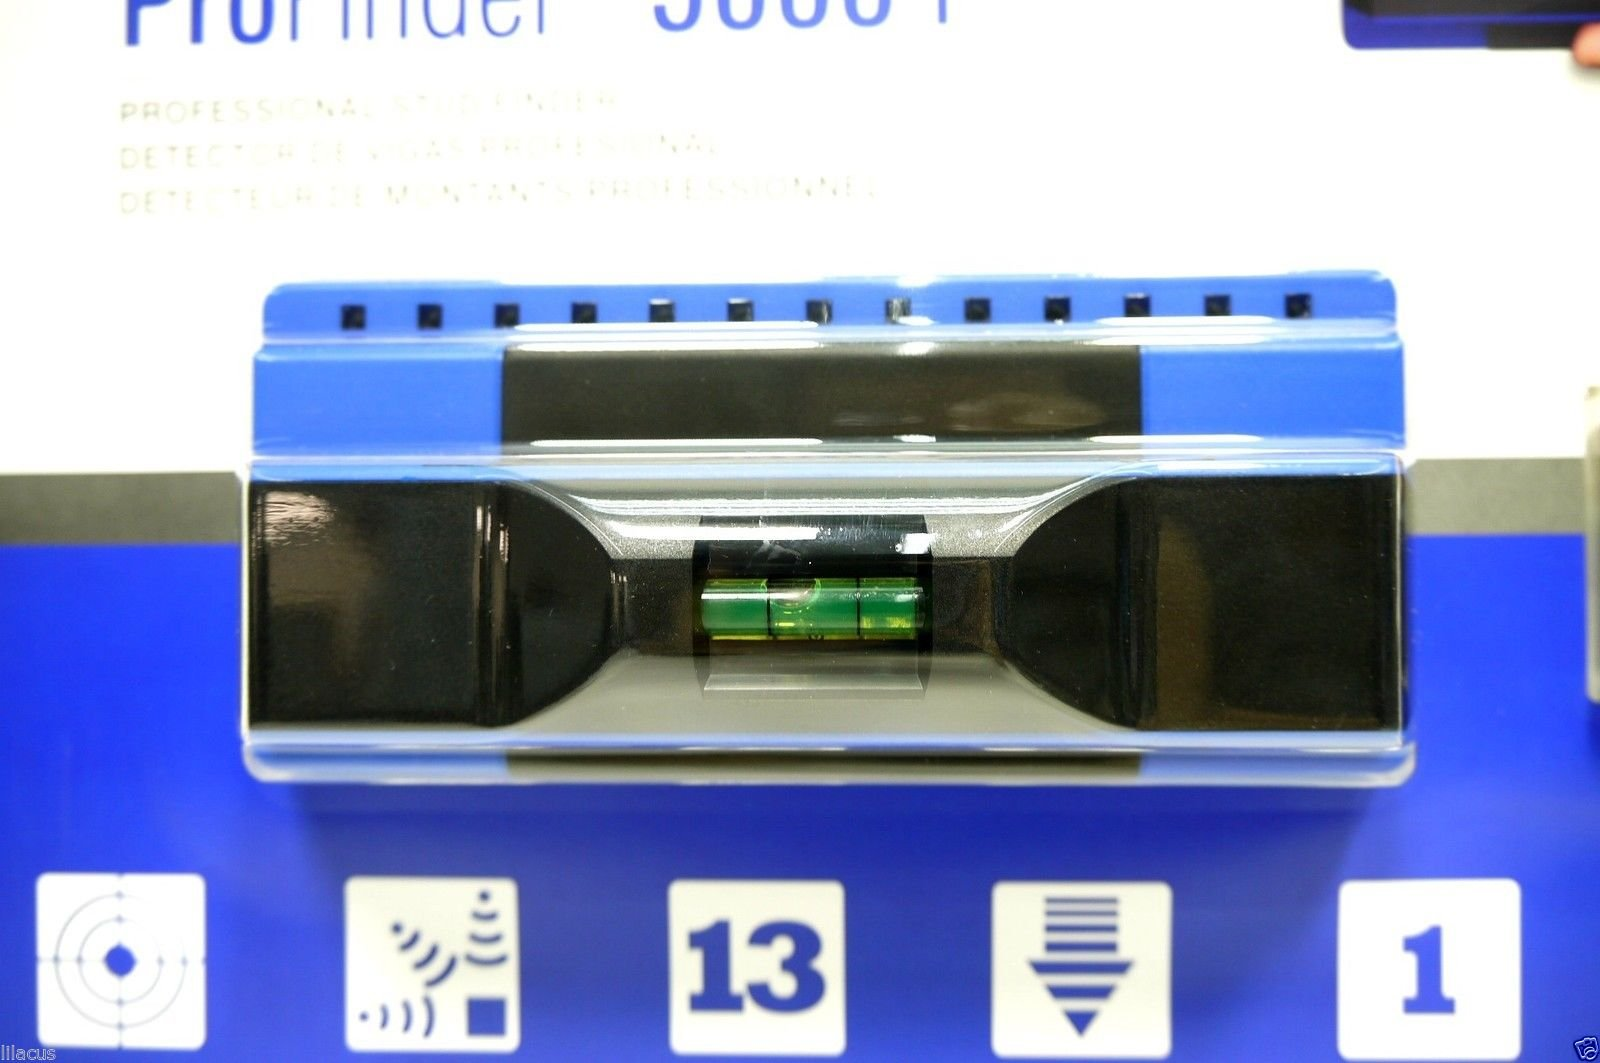 Professional Precision Sensors Profinder 5000+ with Built in Level Construction Stud Finder Construction